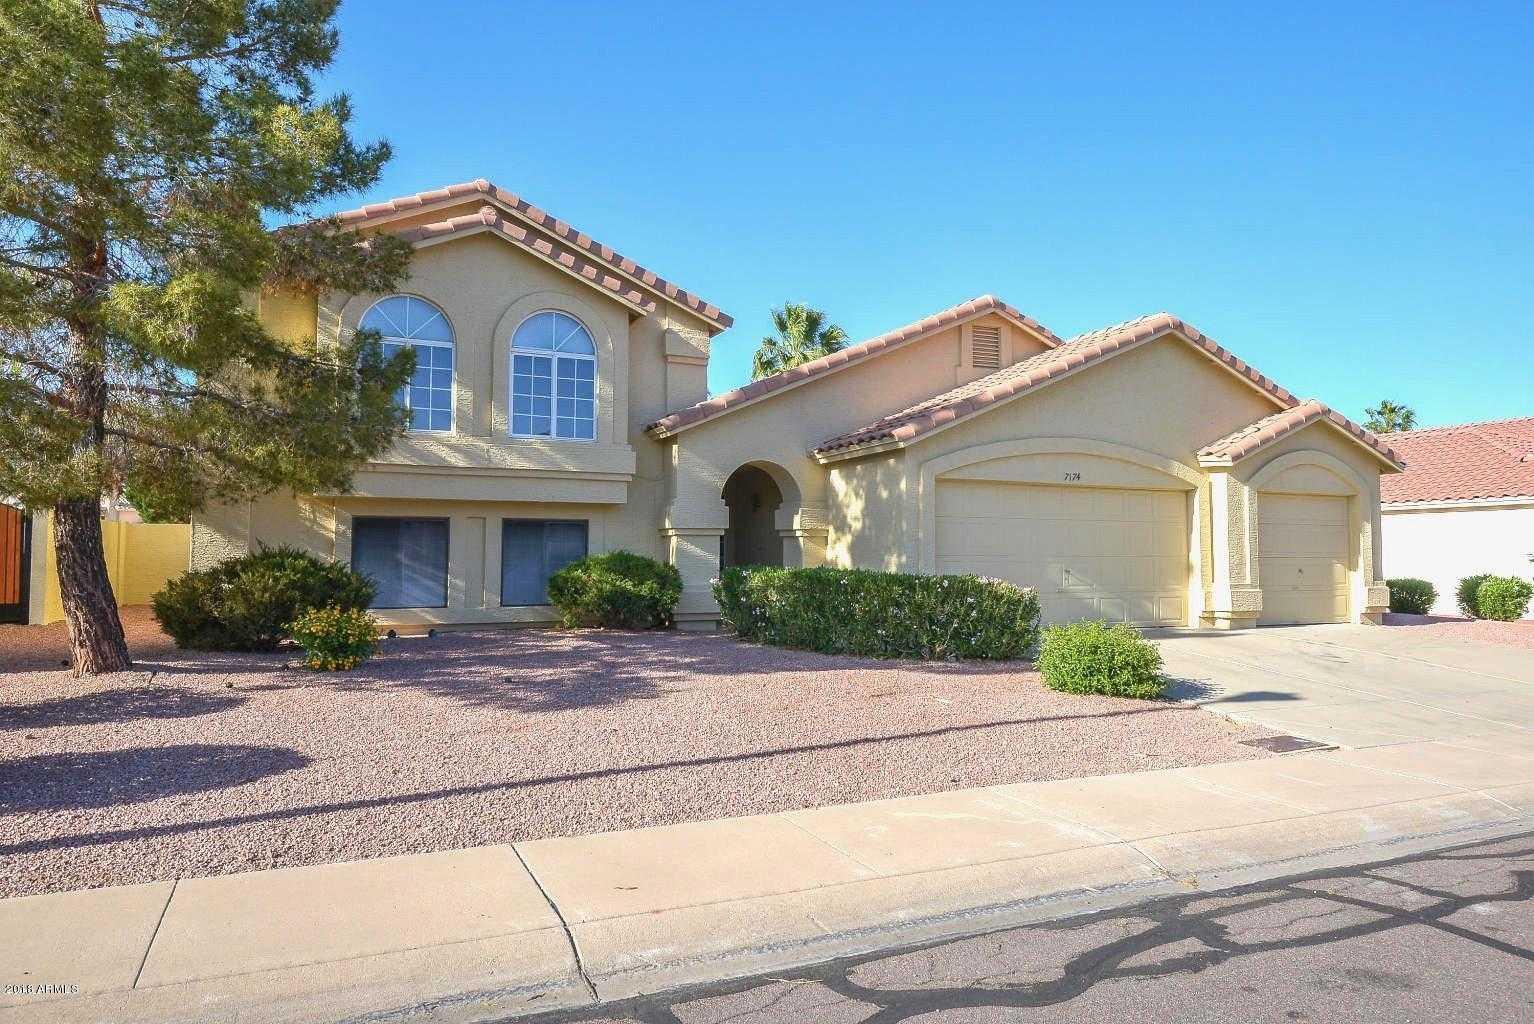 $335,000 - 4Br/3Ba - Home for Sale in Arrowhead Oasis Amd Lt 1-88 Tr A Drainage Easmt, Glendale